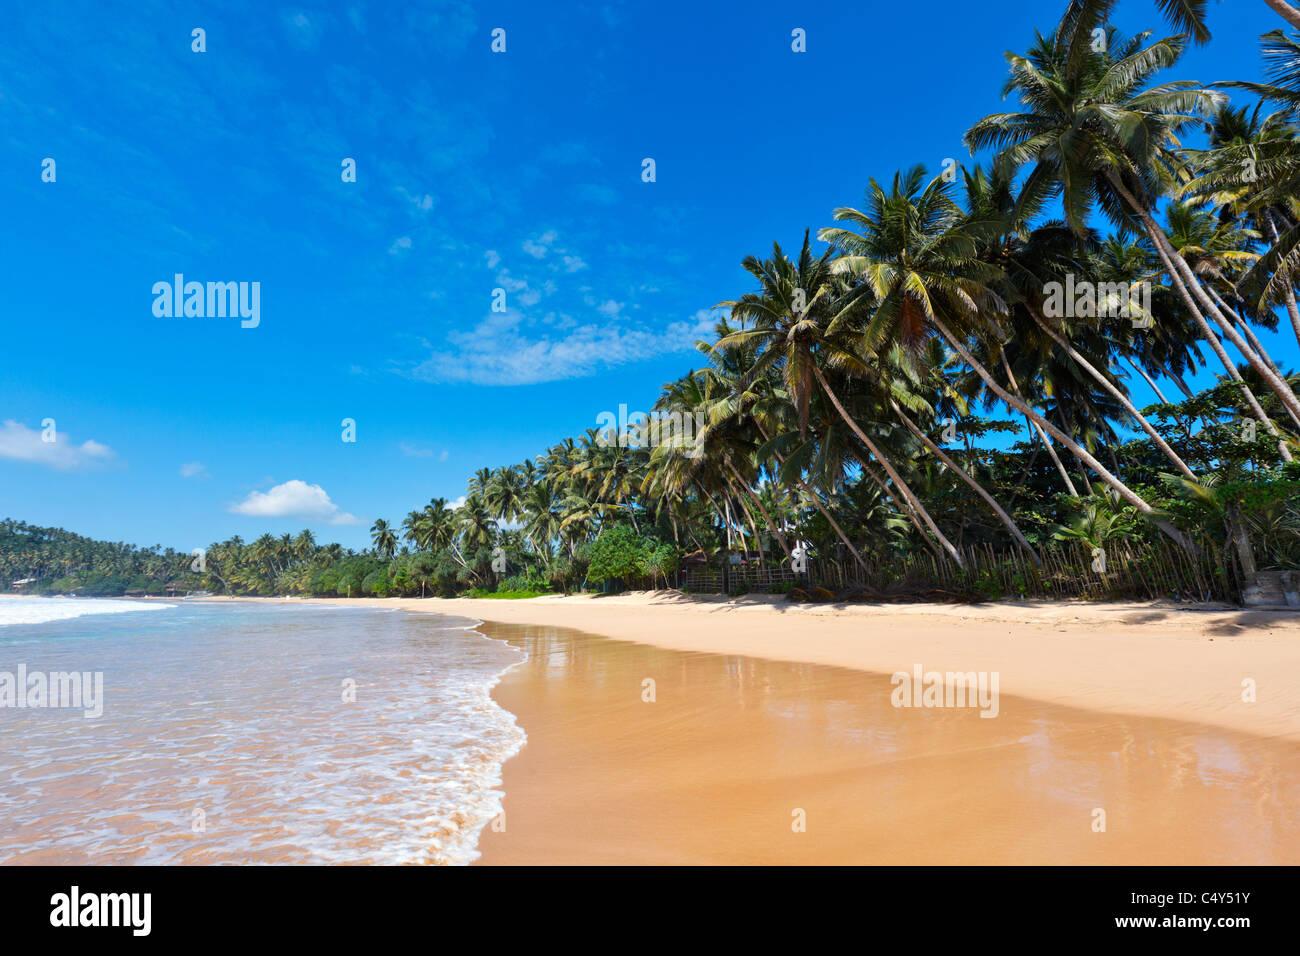 Tropical paradise idyllic beach. Sri Lanka - Stock Image